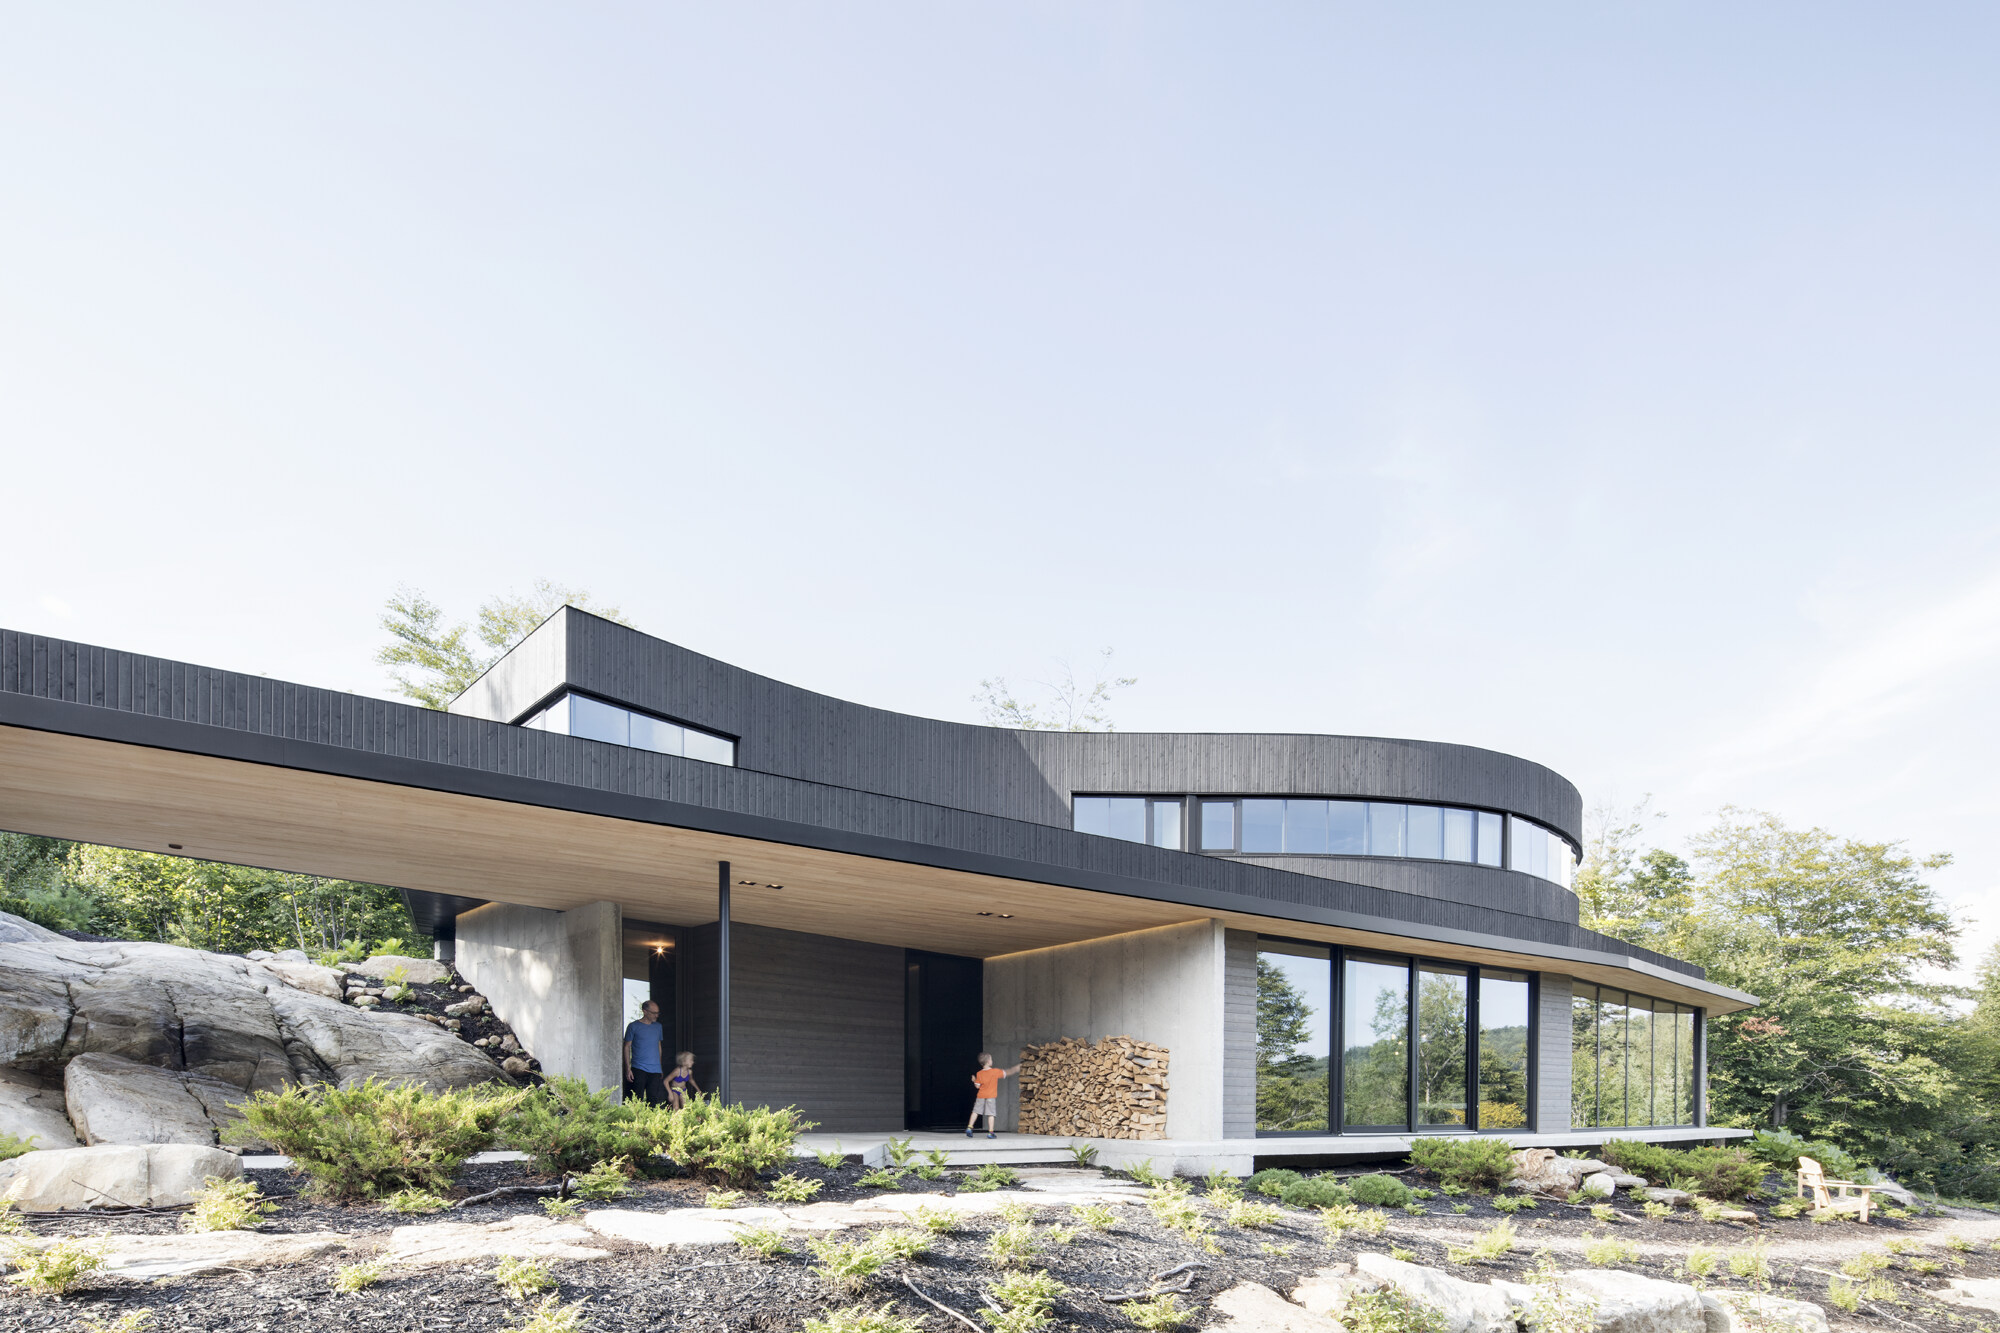 Chef d uvre d architecture leed dans les laurentides for Award winning house plans 2015